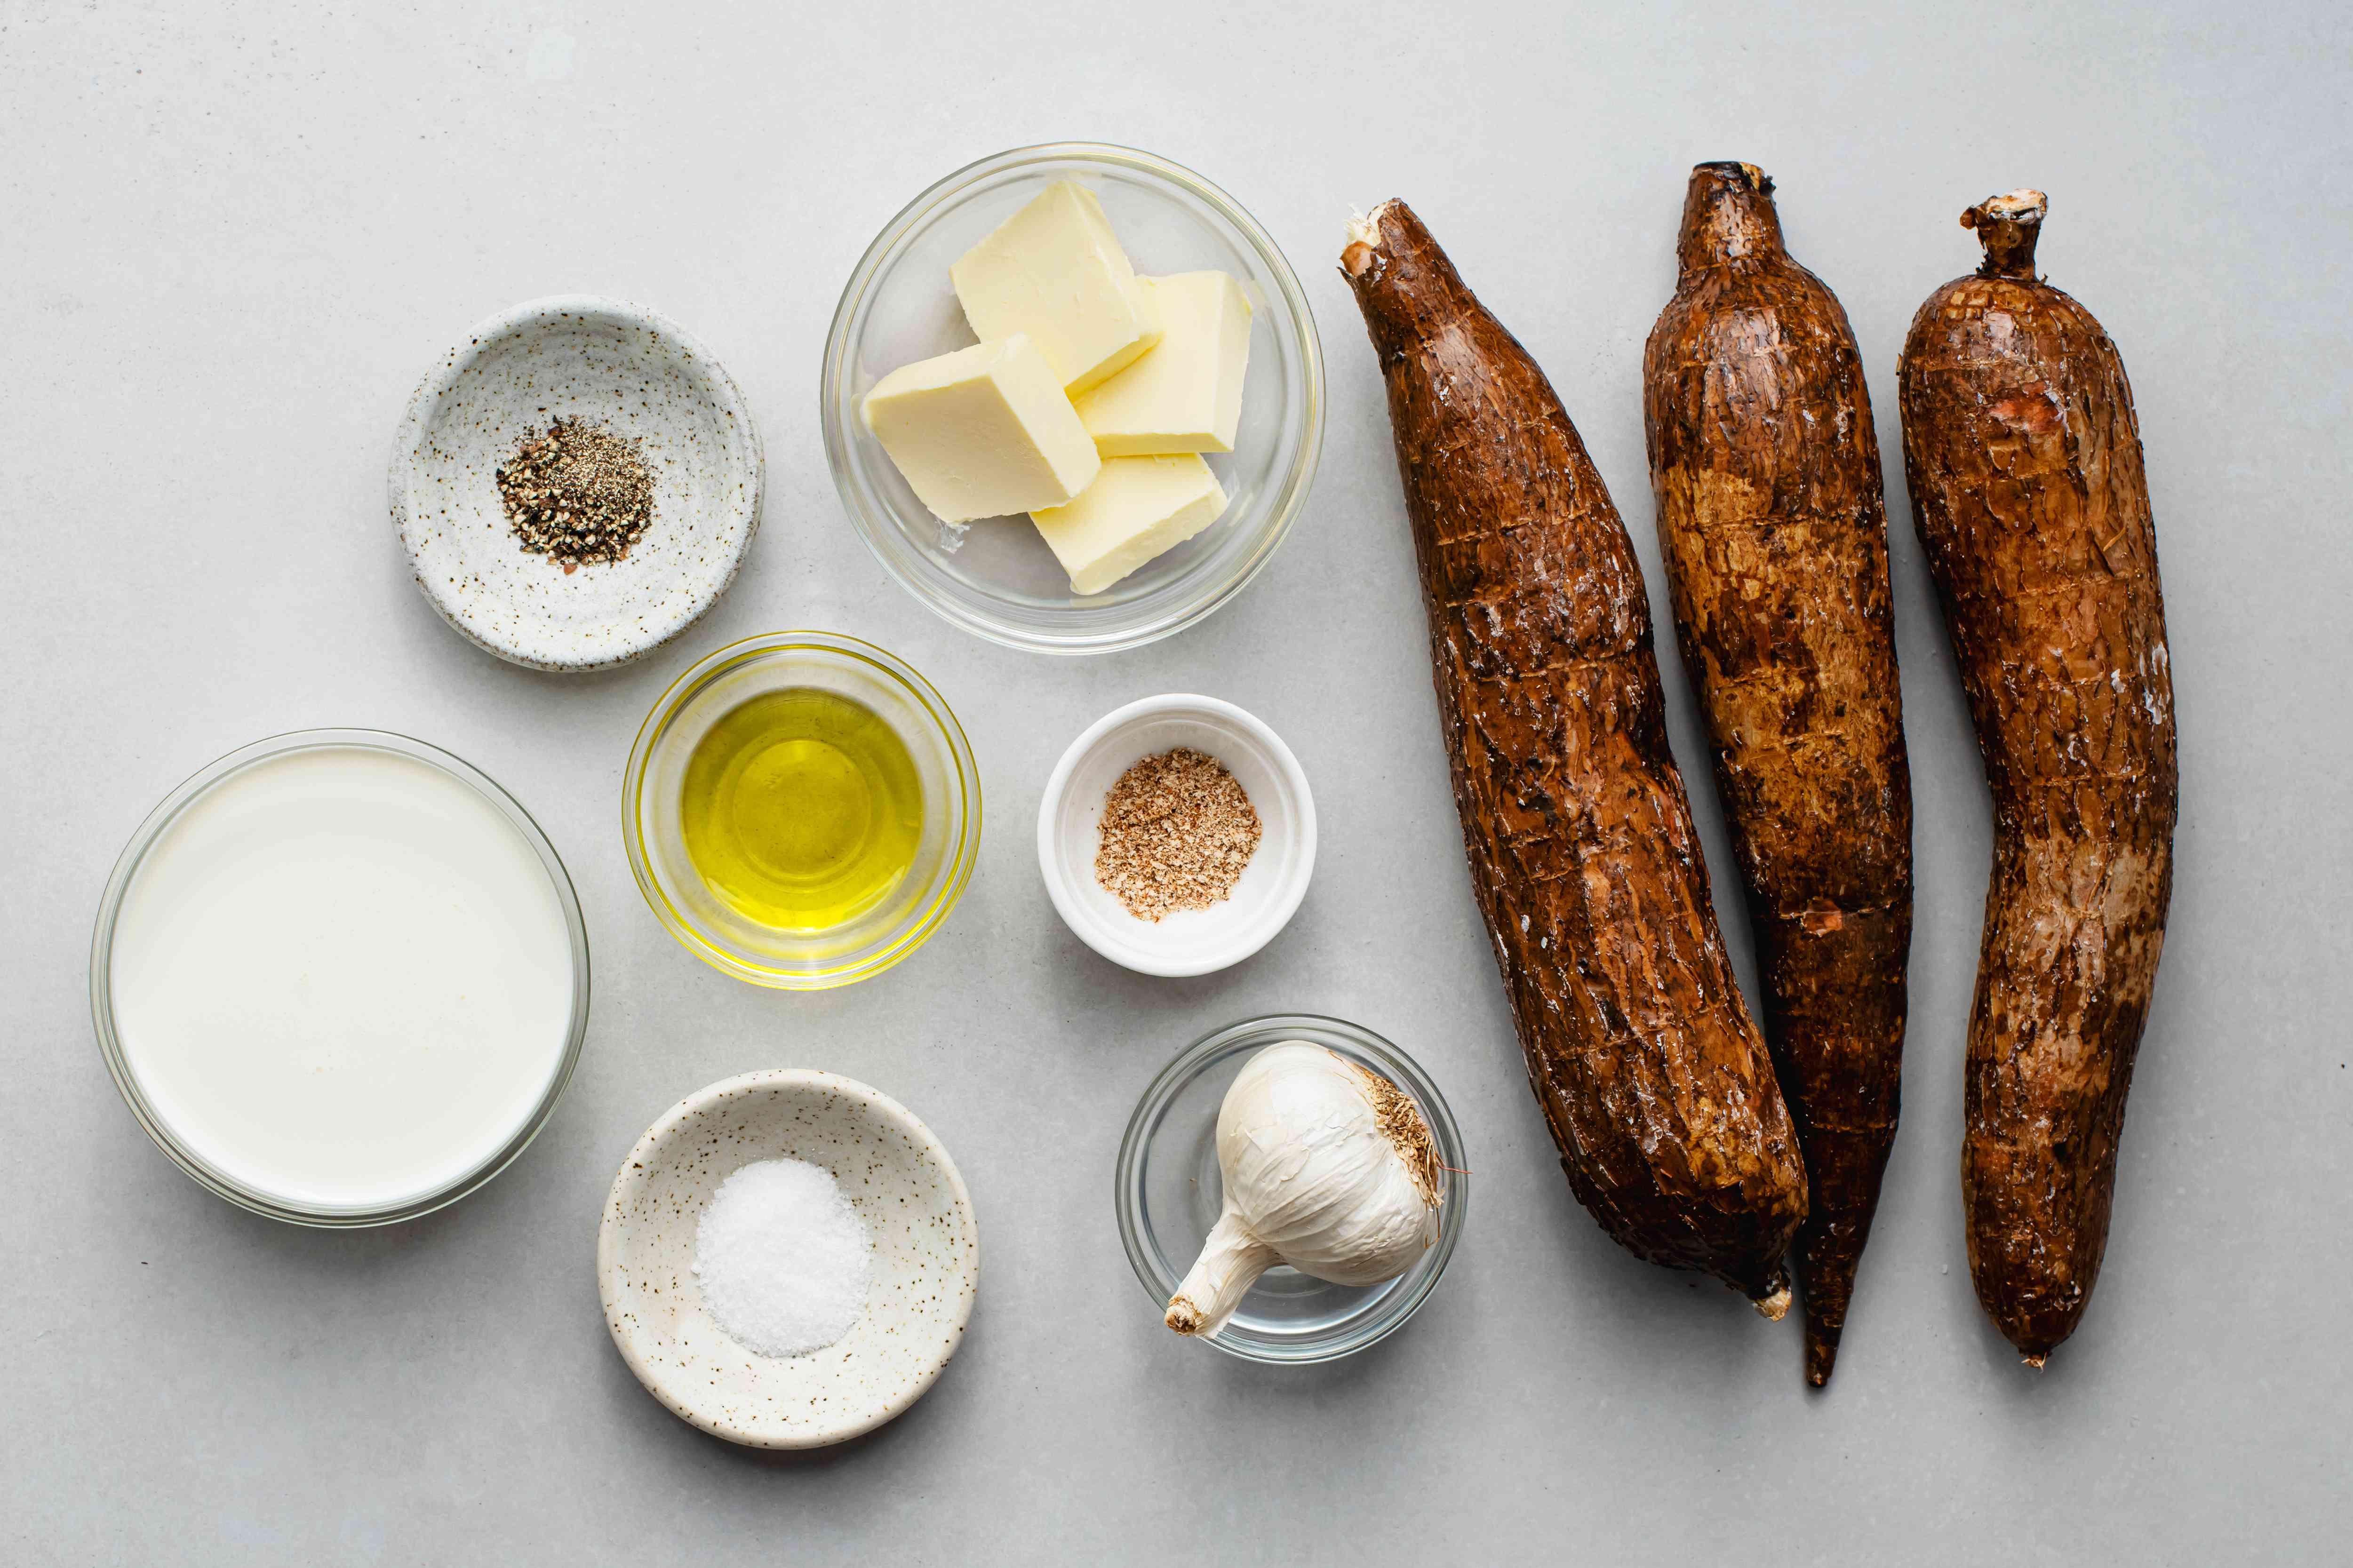 Creamed yuca (cassava) with roasted garlic ingredients